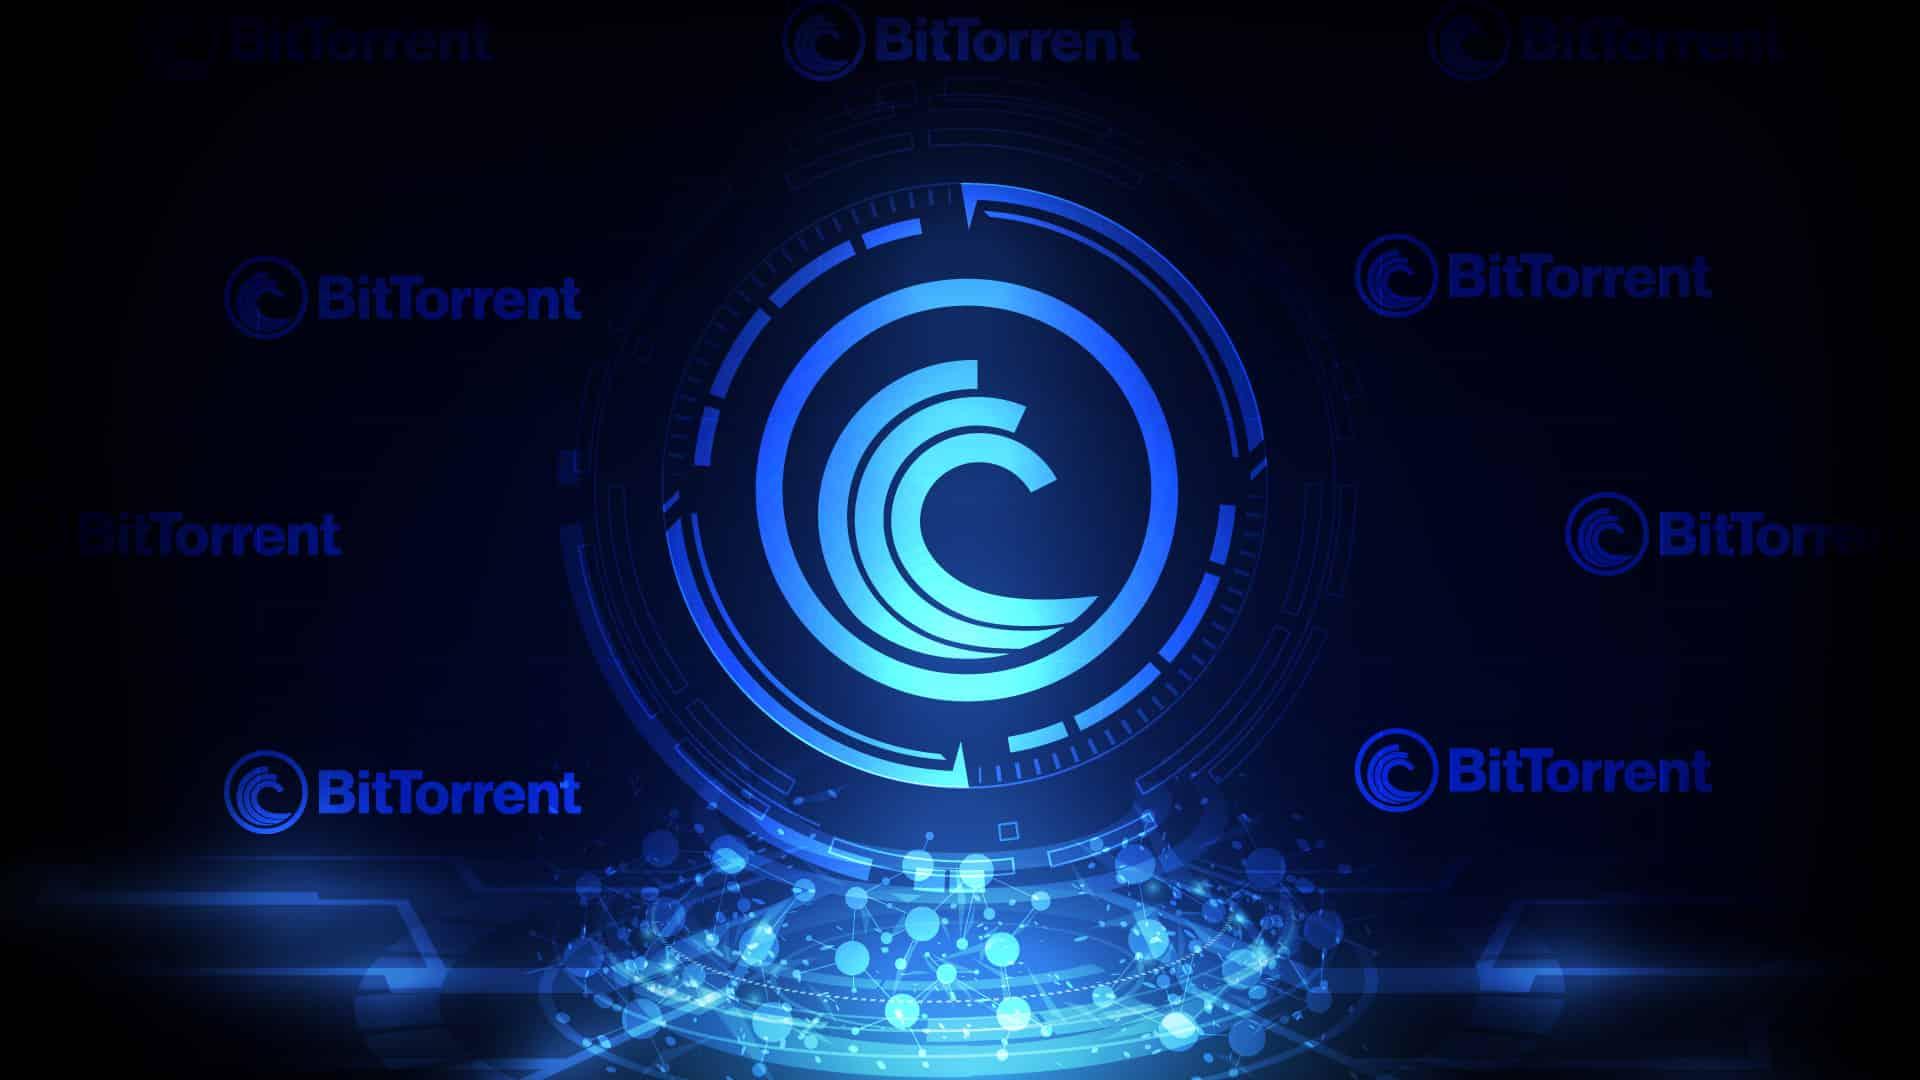 BitTorrent News